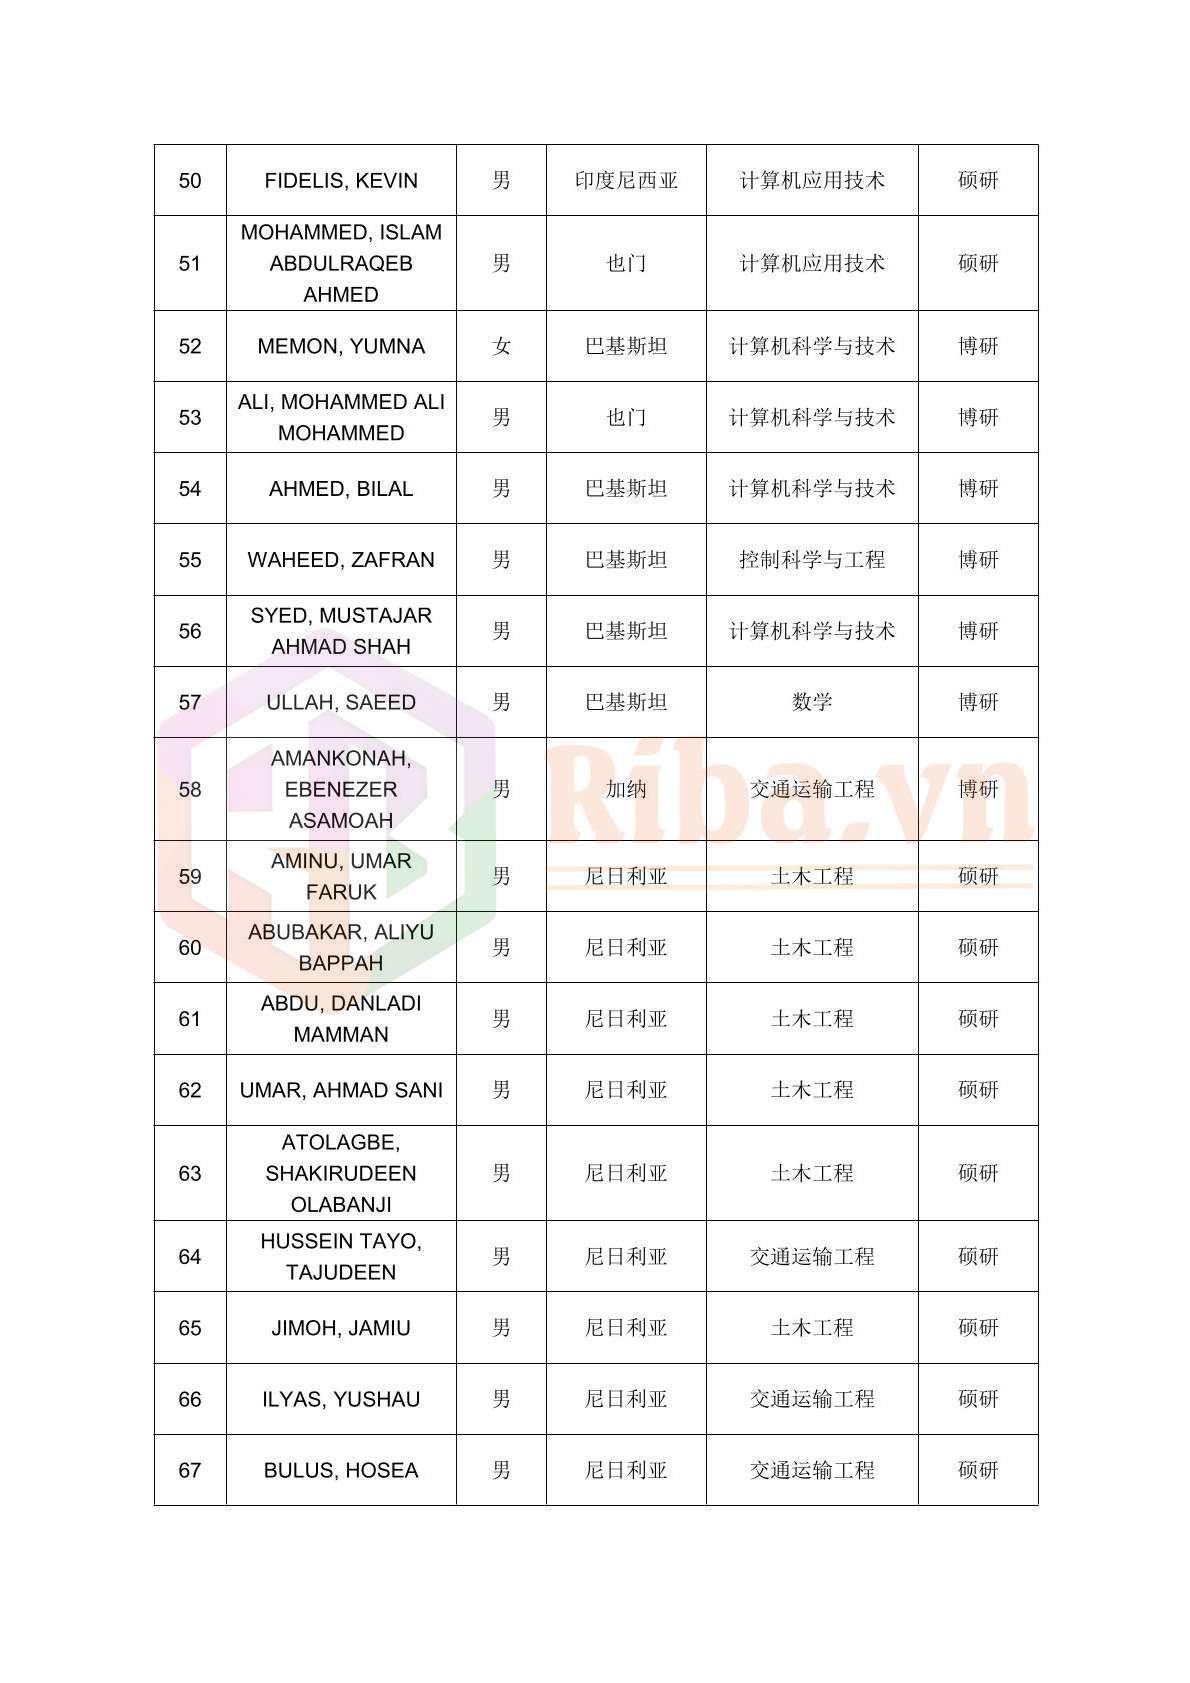 Danh Sach Do Hoc Bong Csc Dai Hoc Trung Nam 2020 04 2021